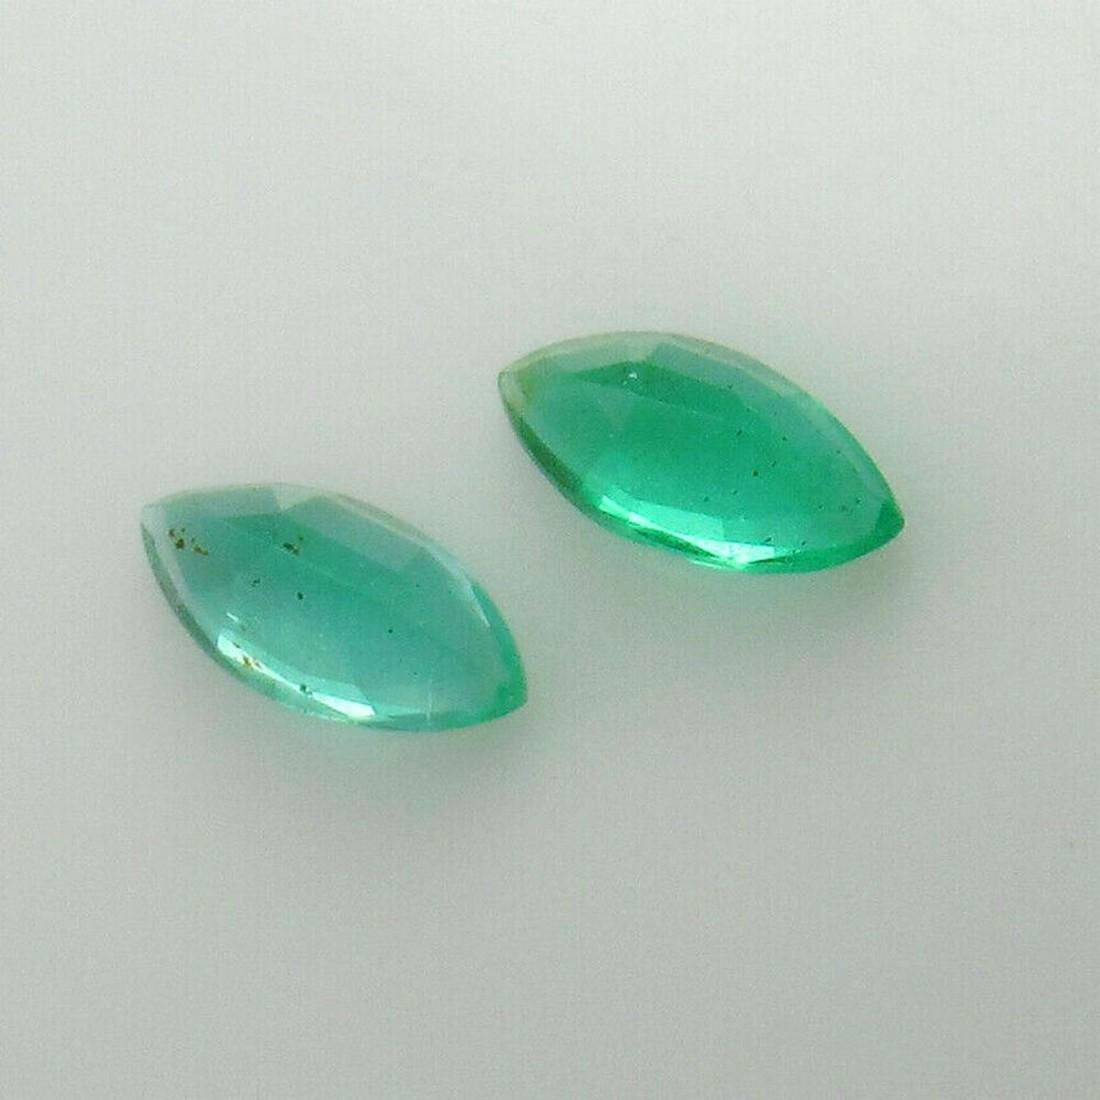 0.74 Ct Natural Zambian Emerald Marquise Pair